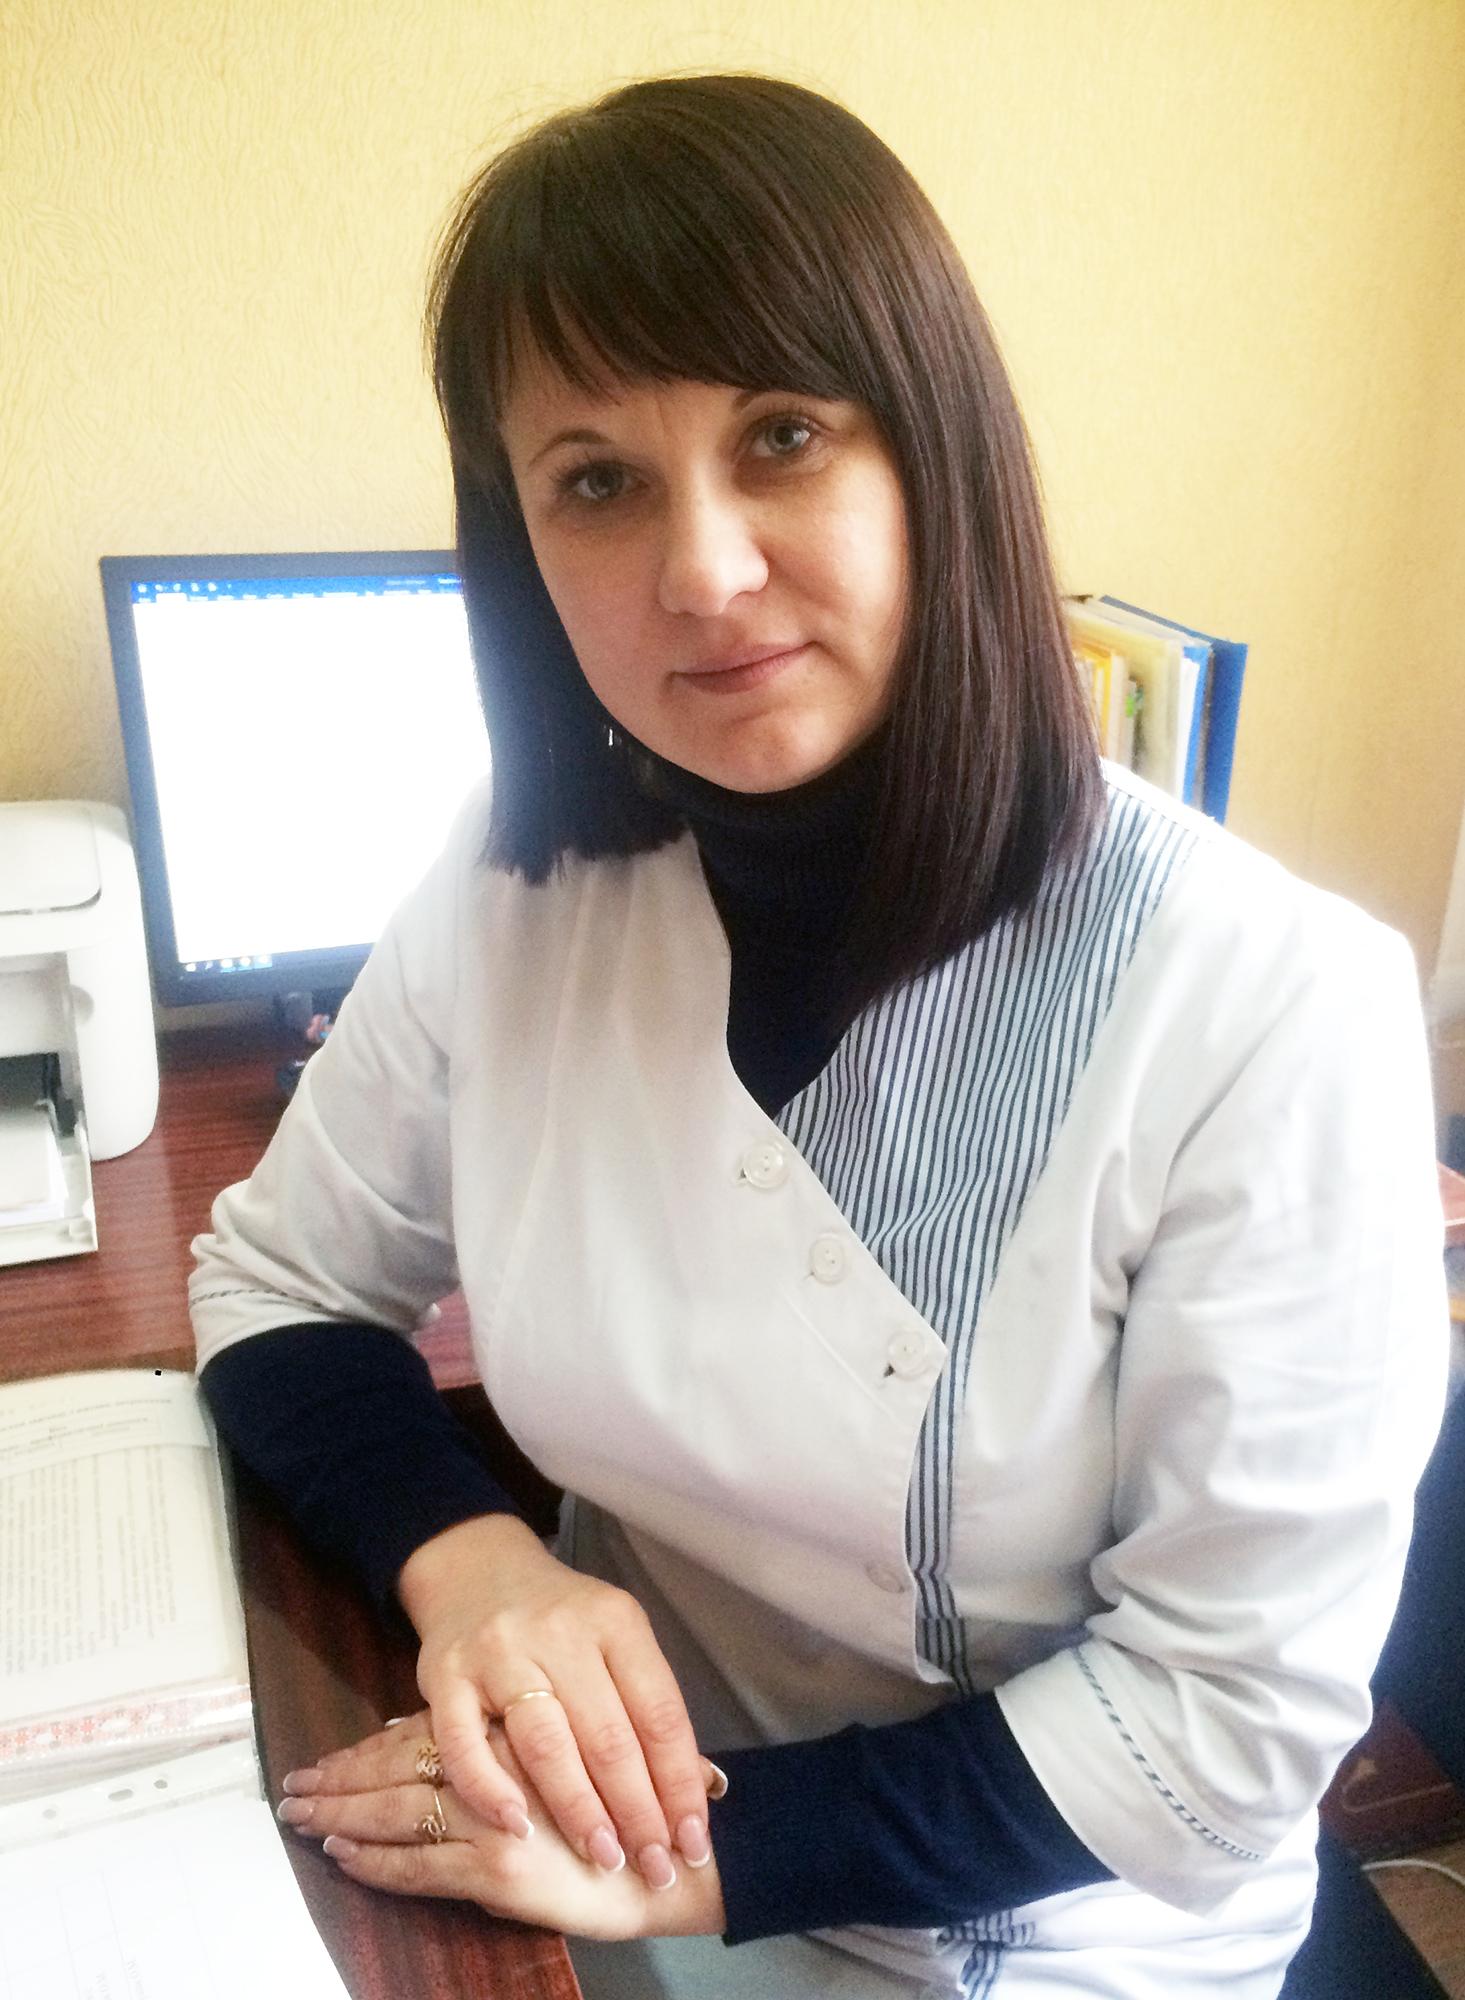 Грушак Олена Миколаївна, головна медична сестра